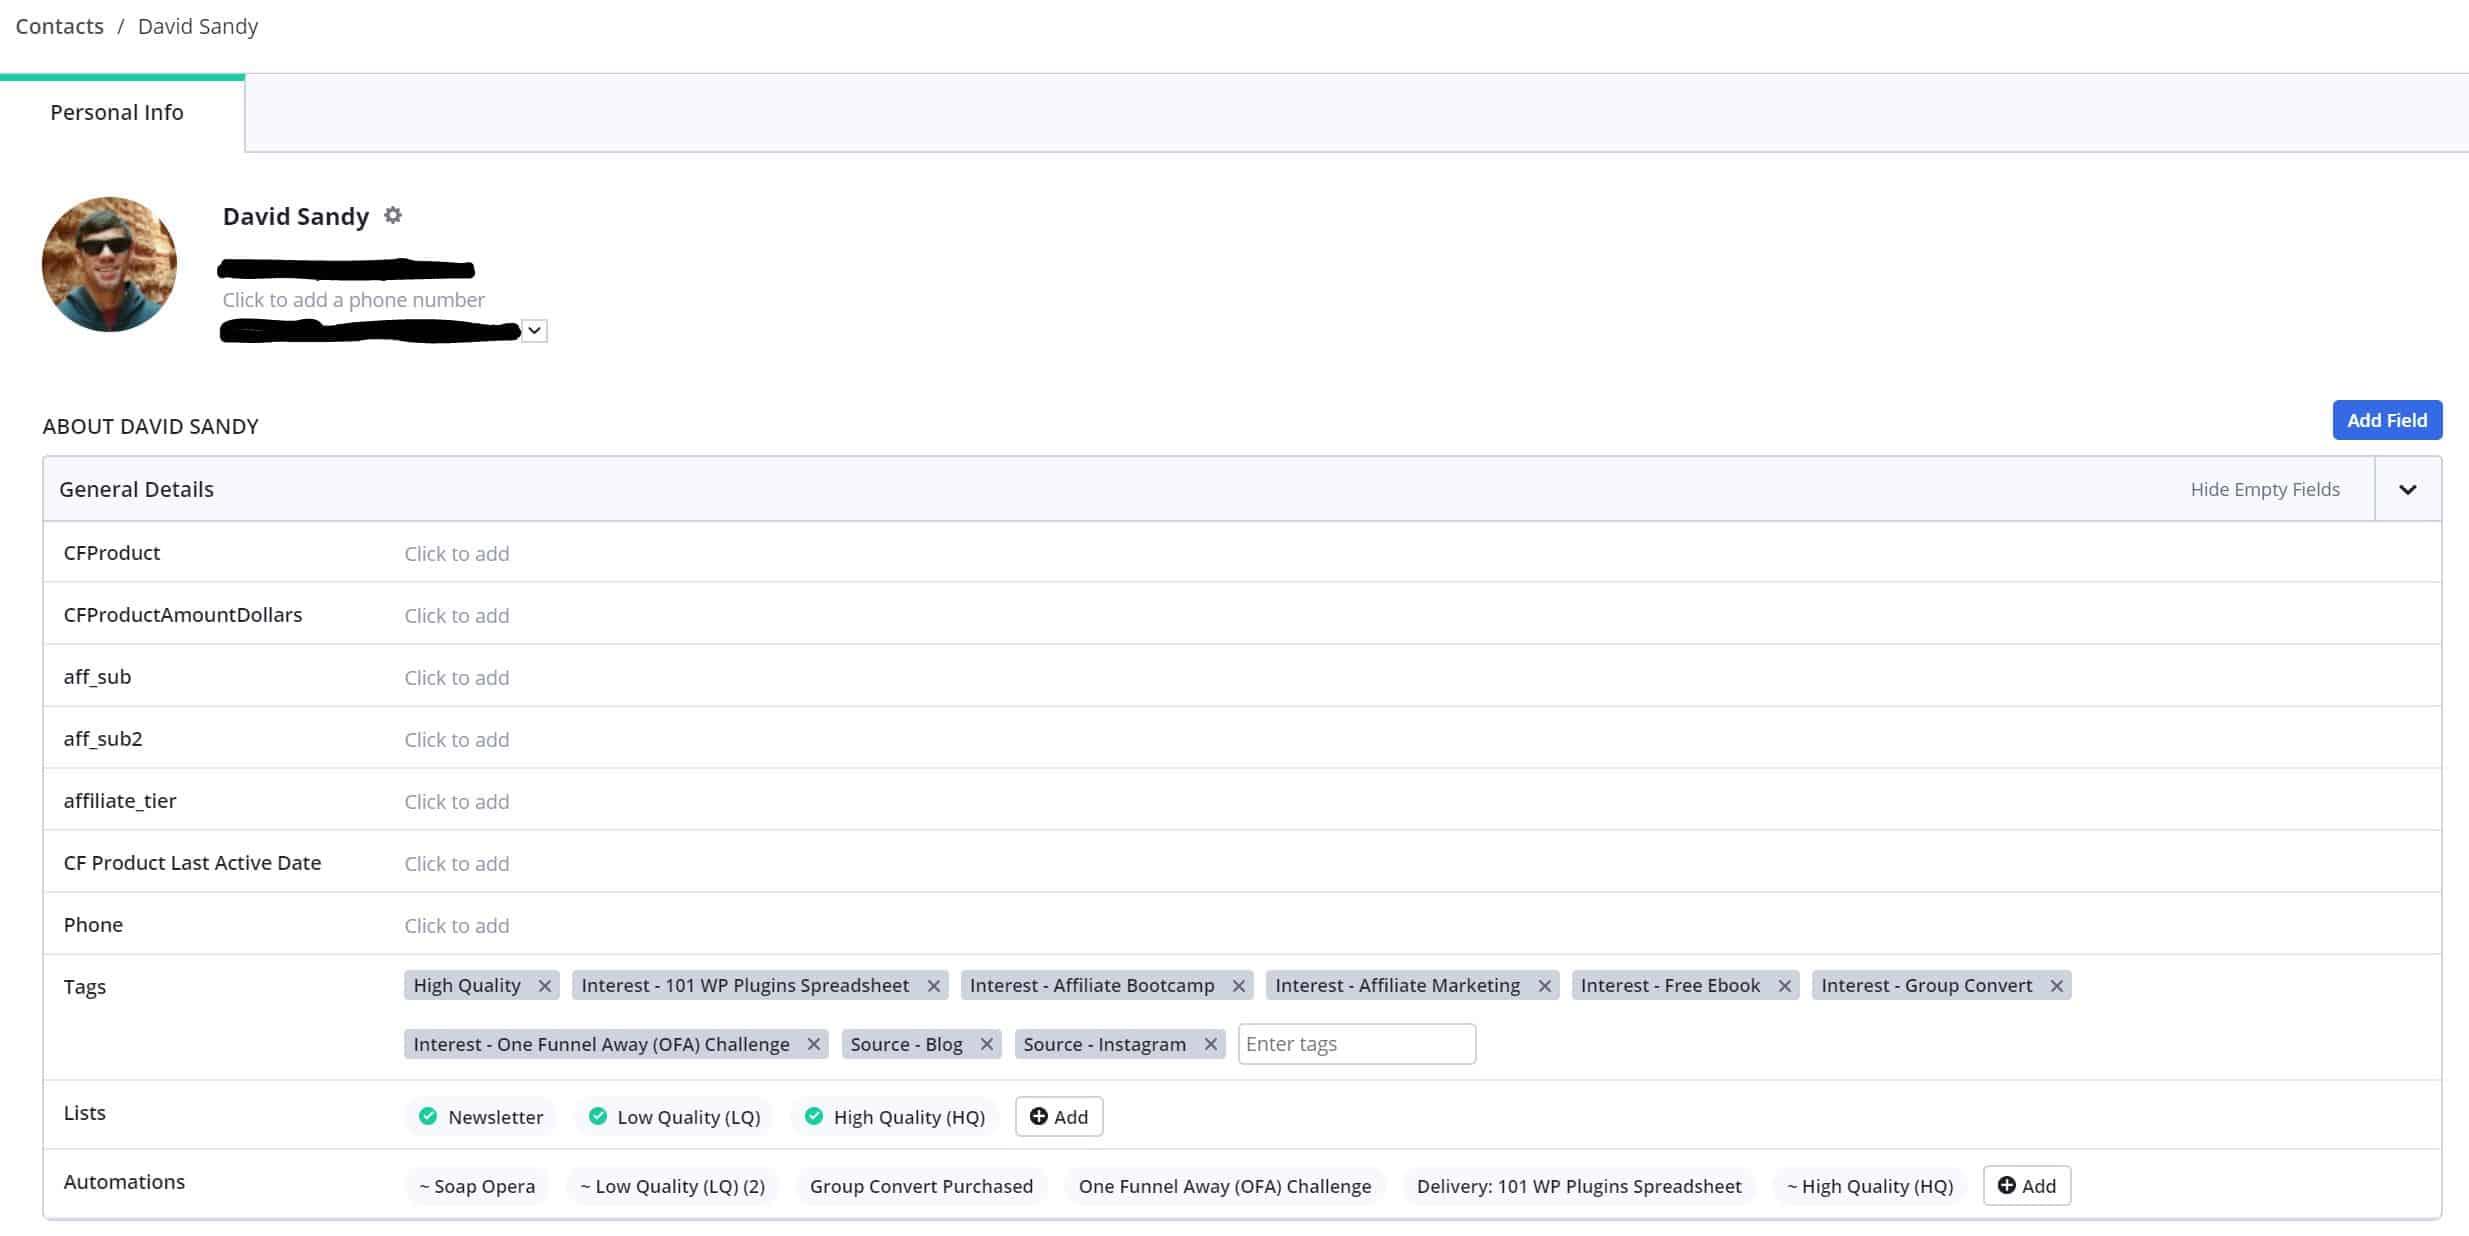 ActiveCampaign Contact Profiles